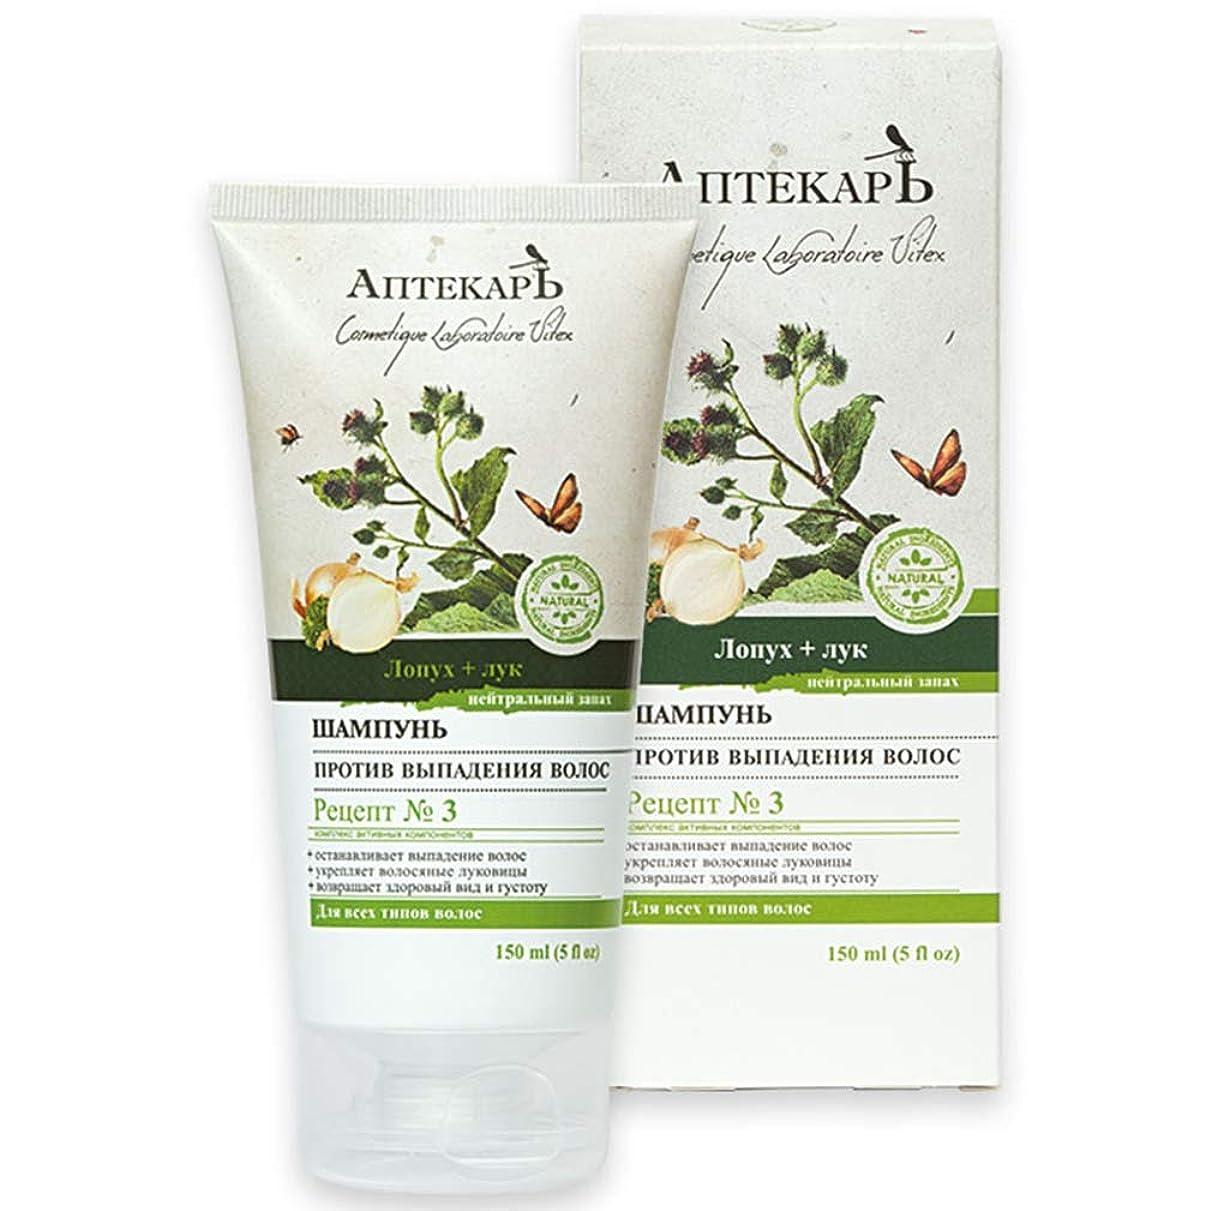 Bielita & Vitex   Chemist Line   Shampoo against hair loss   Recipe number 3   Burdock   Onions   150 ml